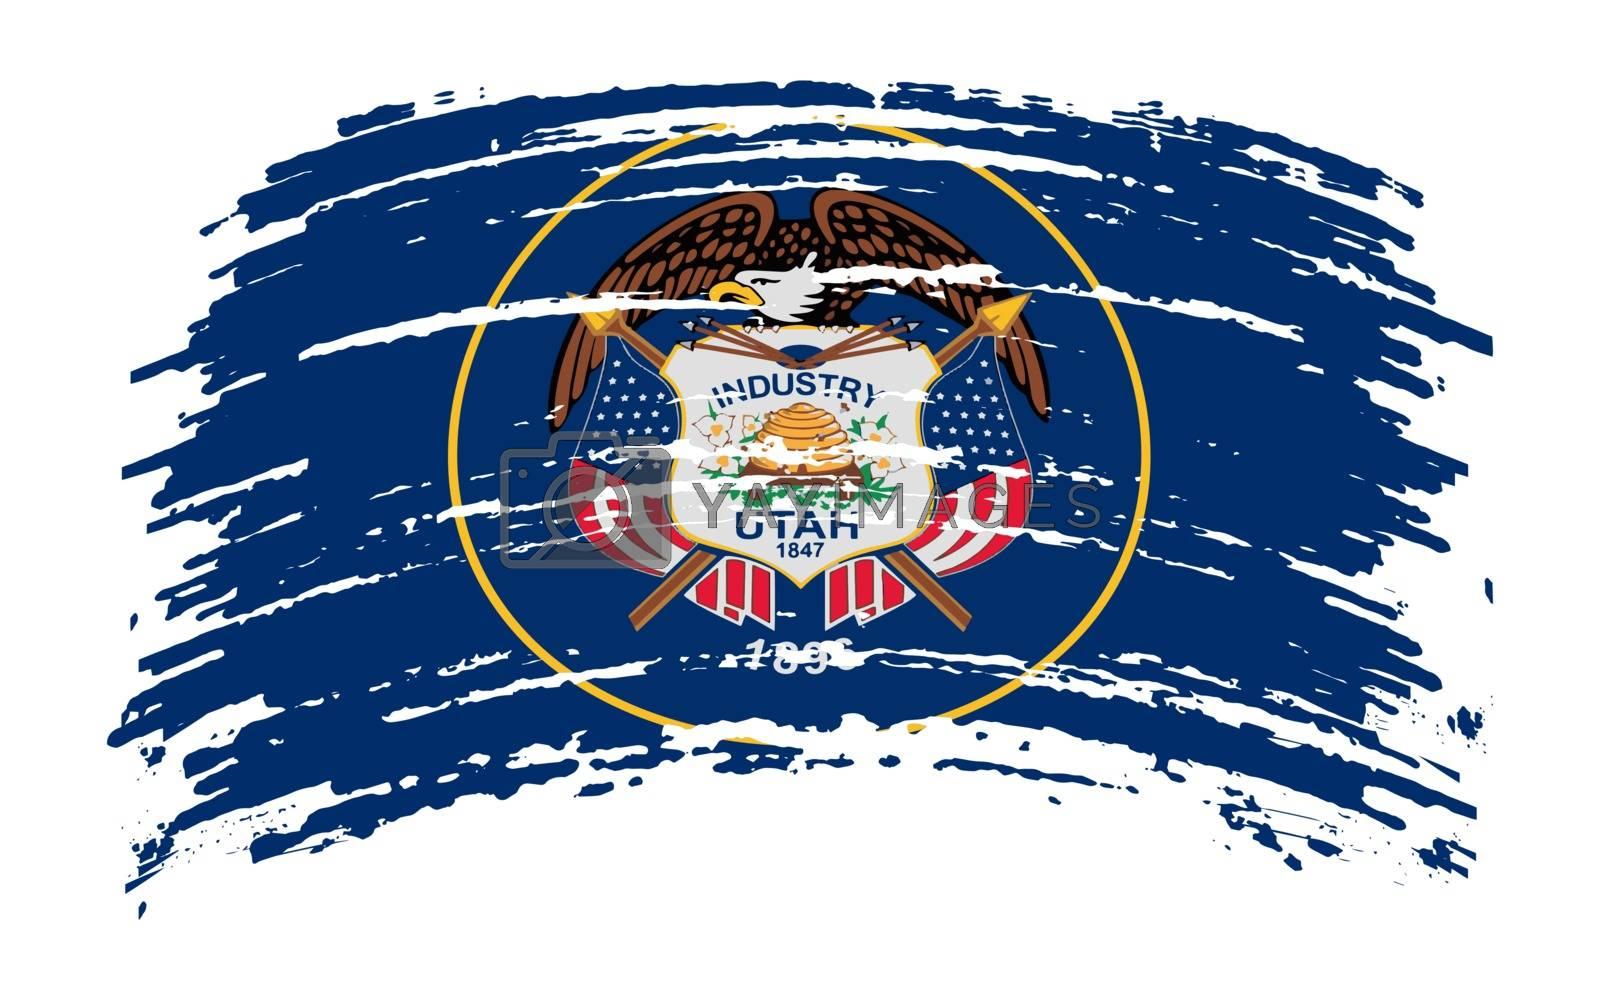 Utah US flag in grunge brush stroke, vector image